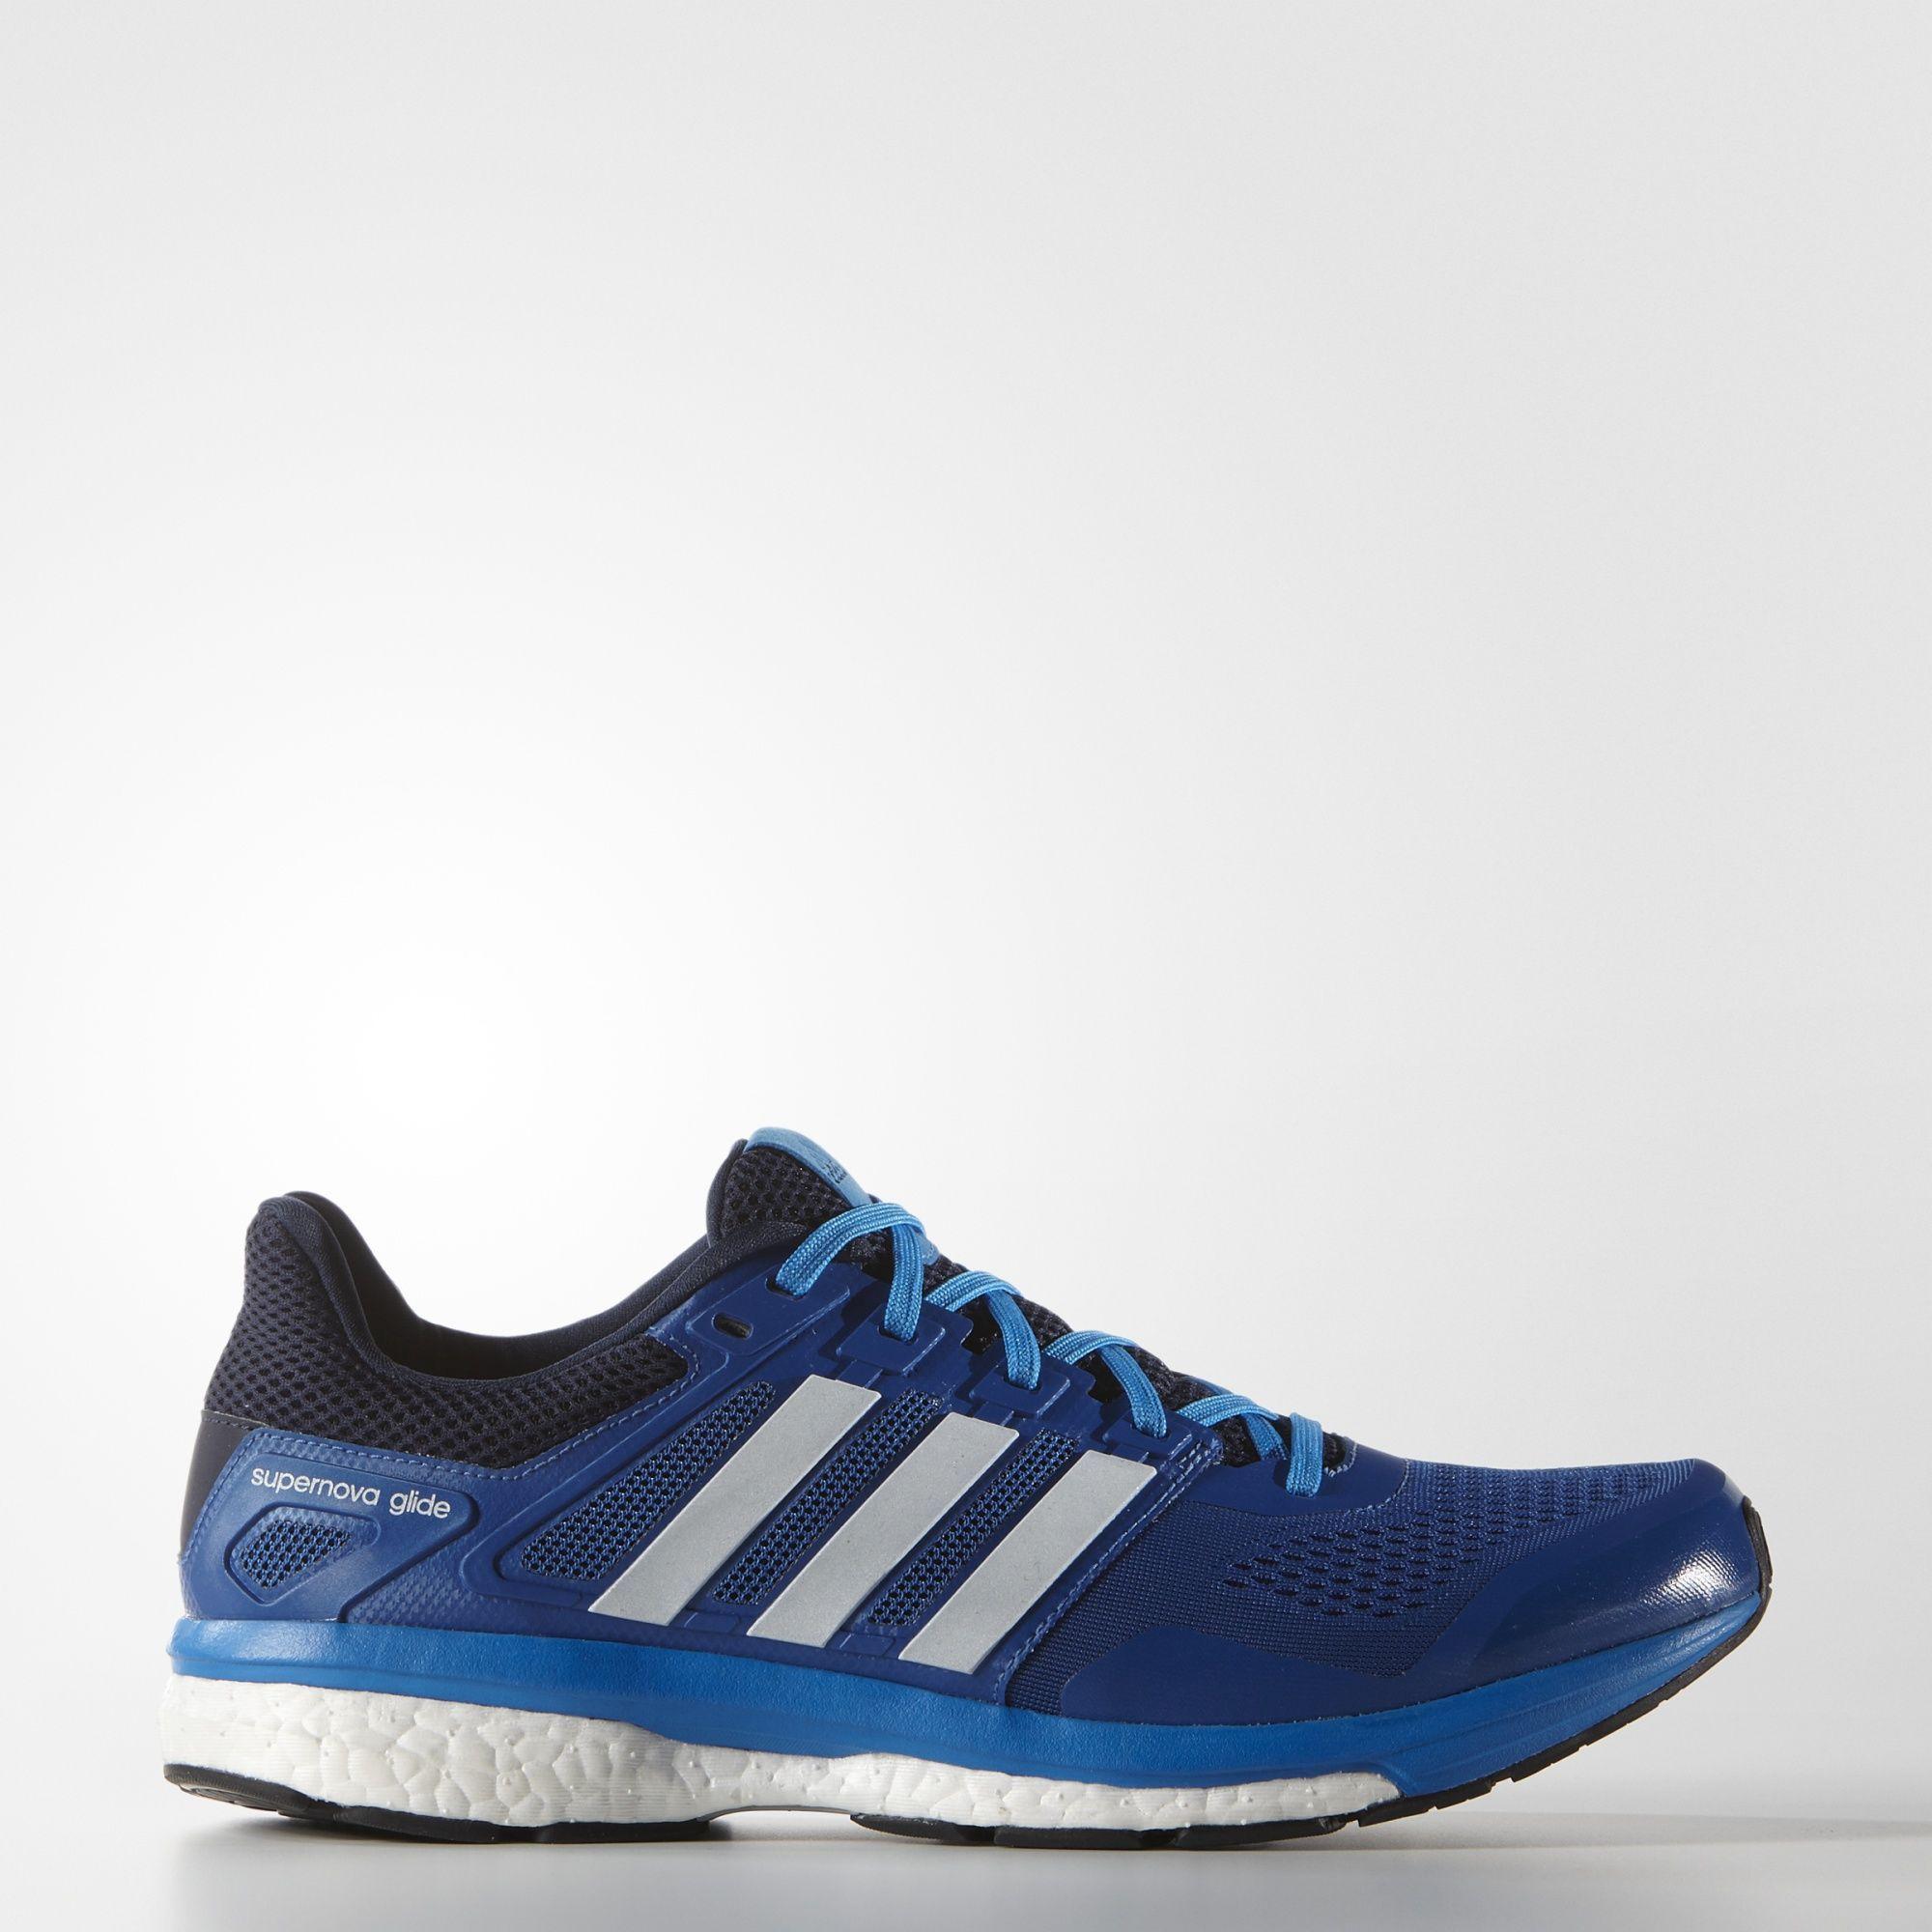 Adidas Supernova Glide 8 Zapatos Botines infantiles 2016